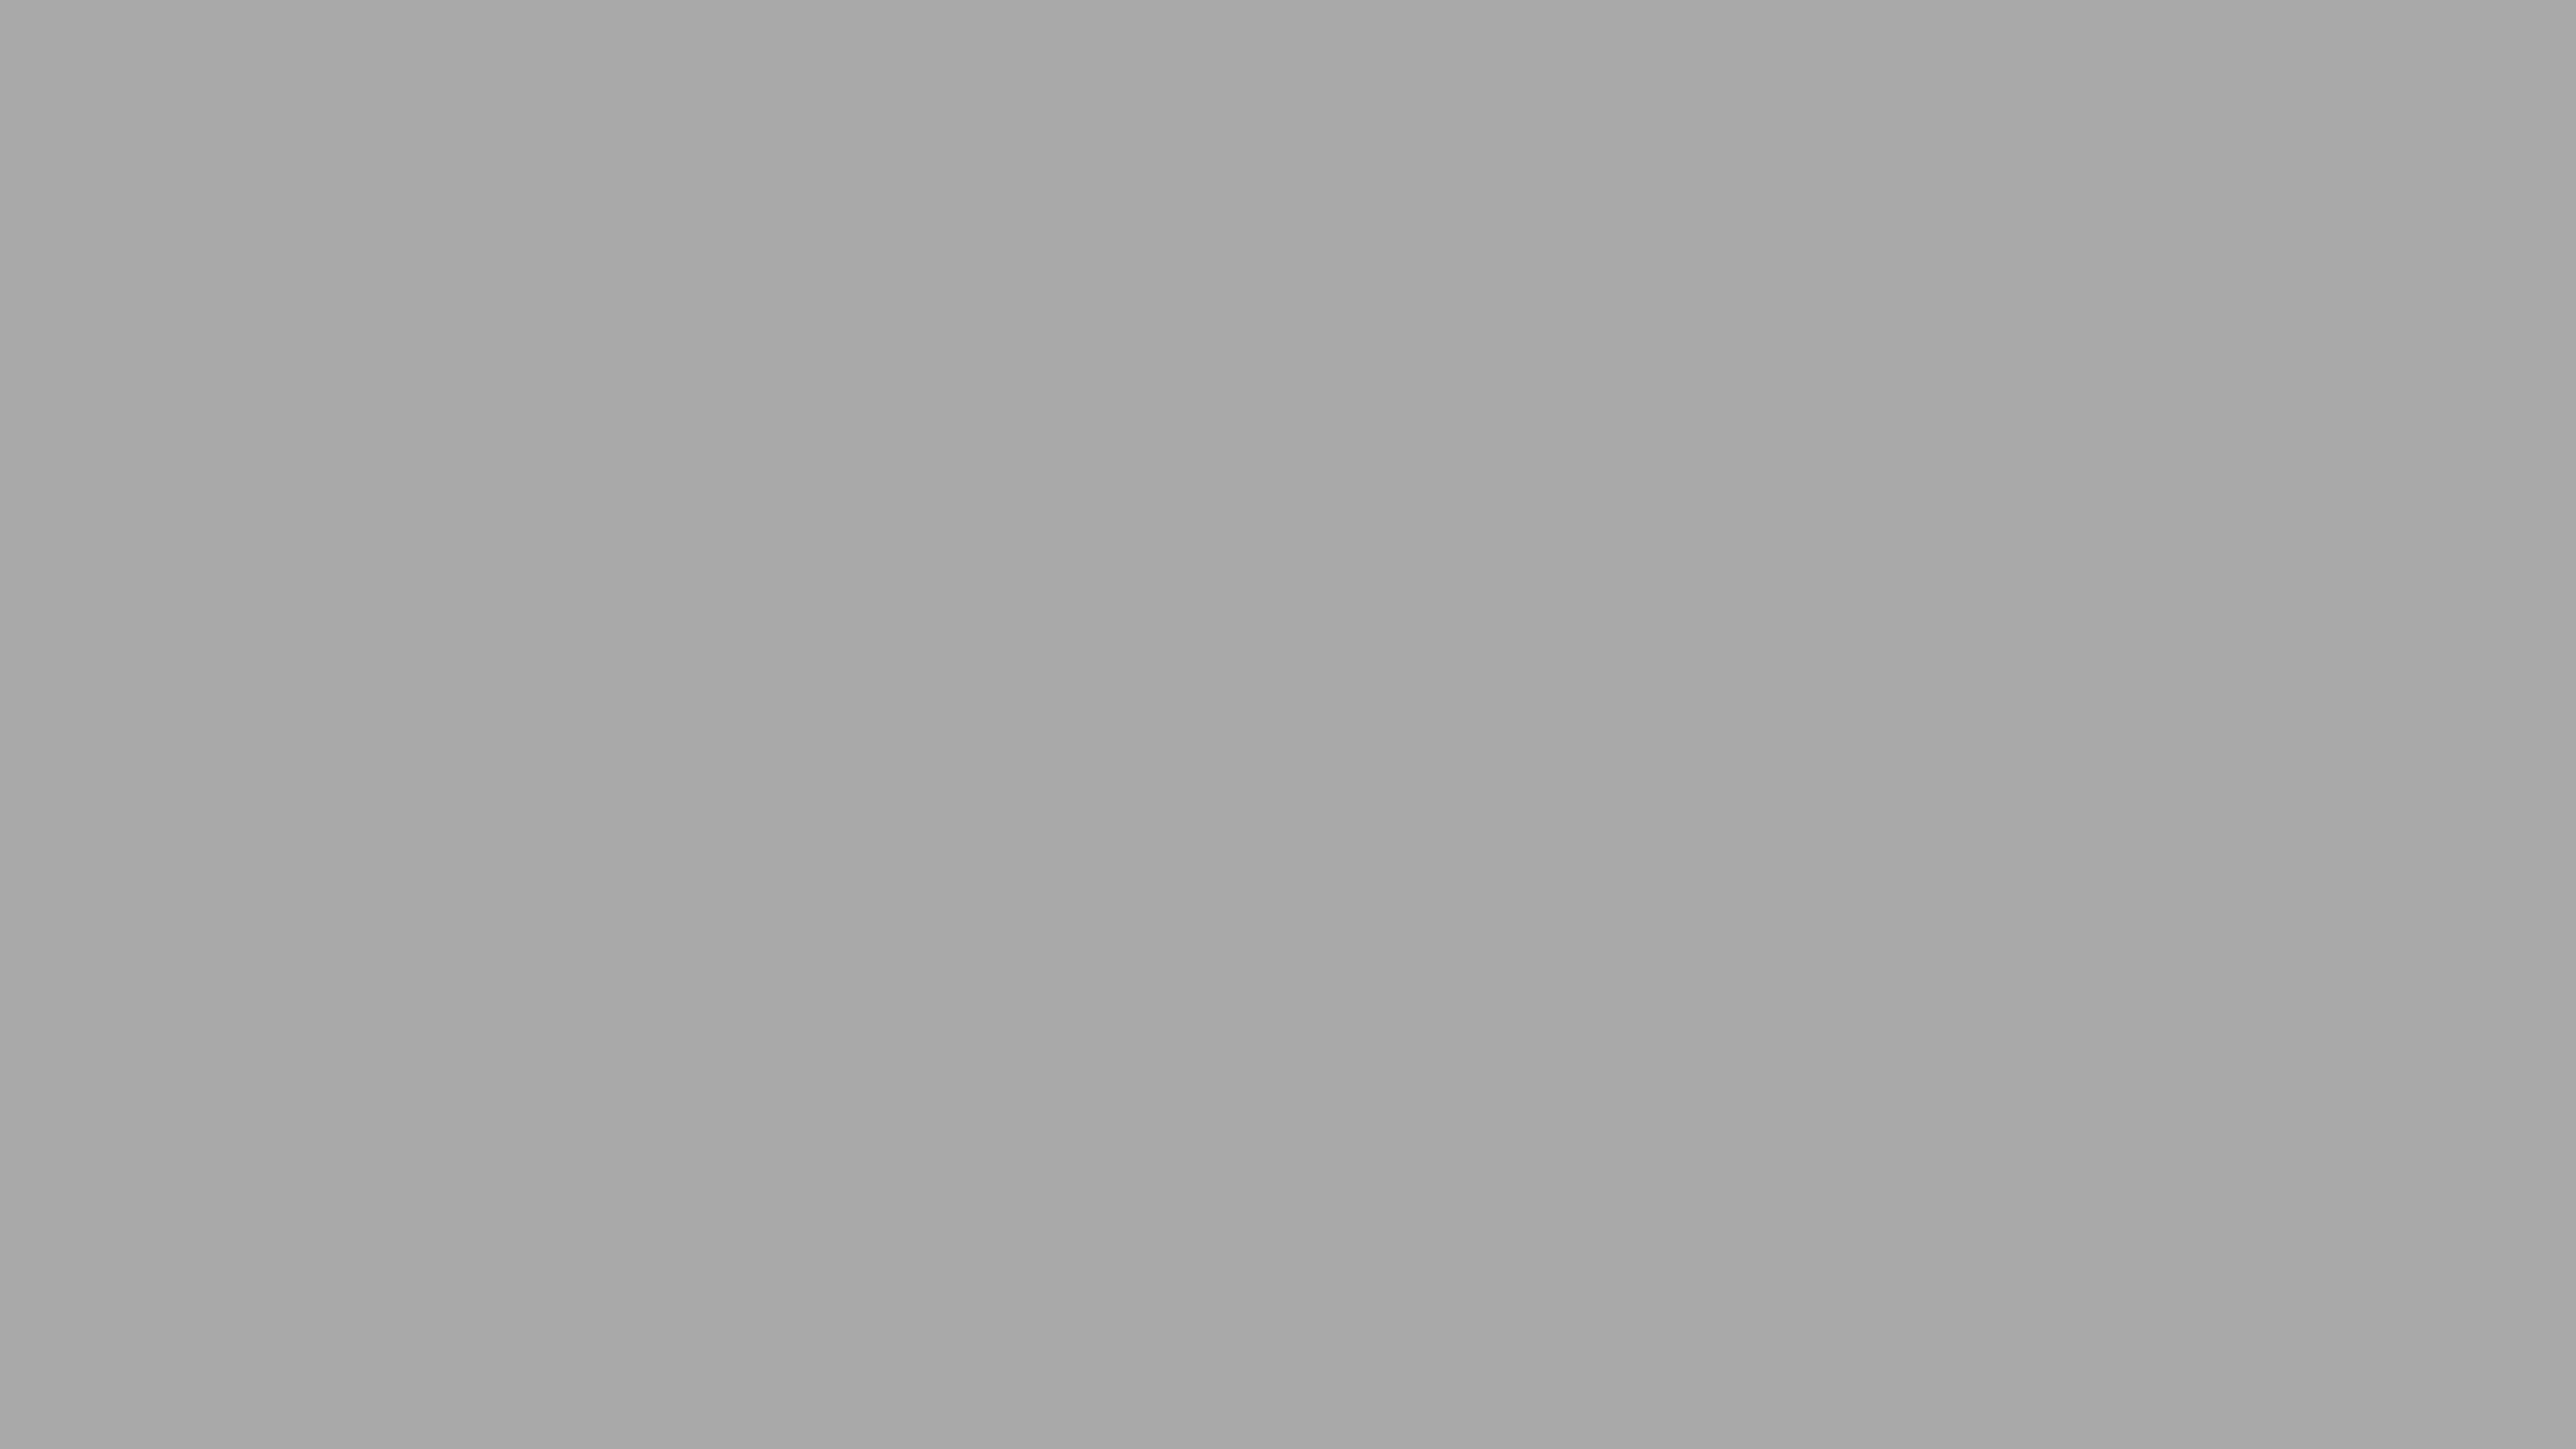 4096x2304 Dark Gray Solid Color Background